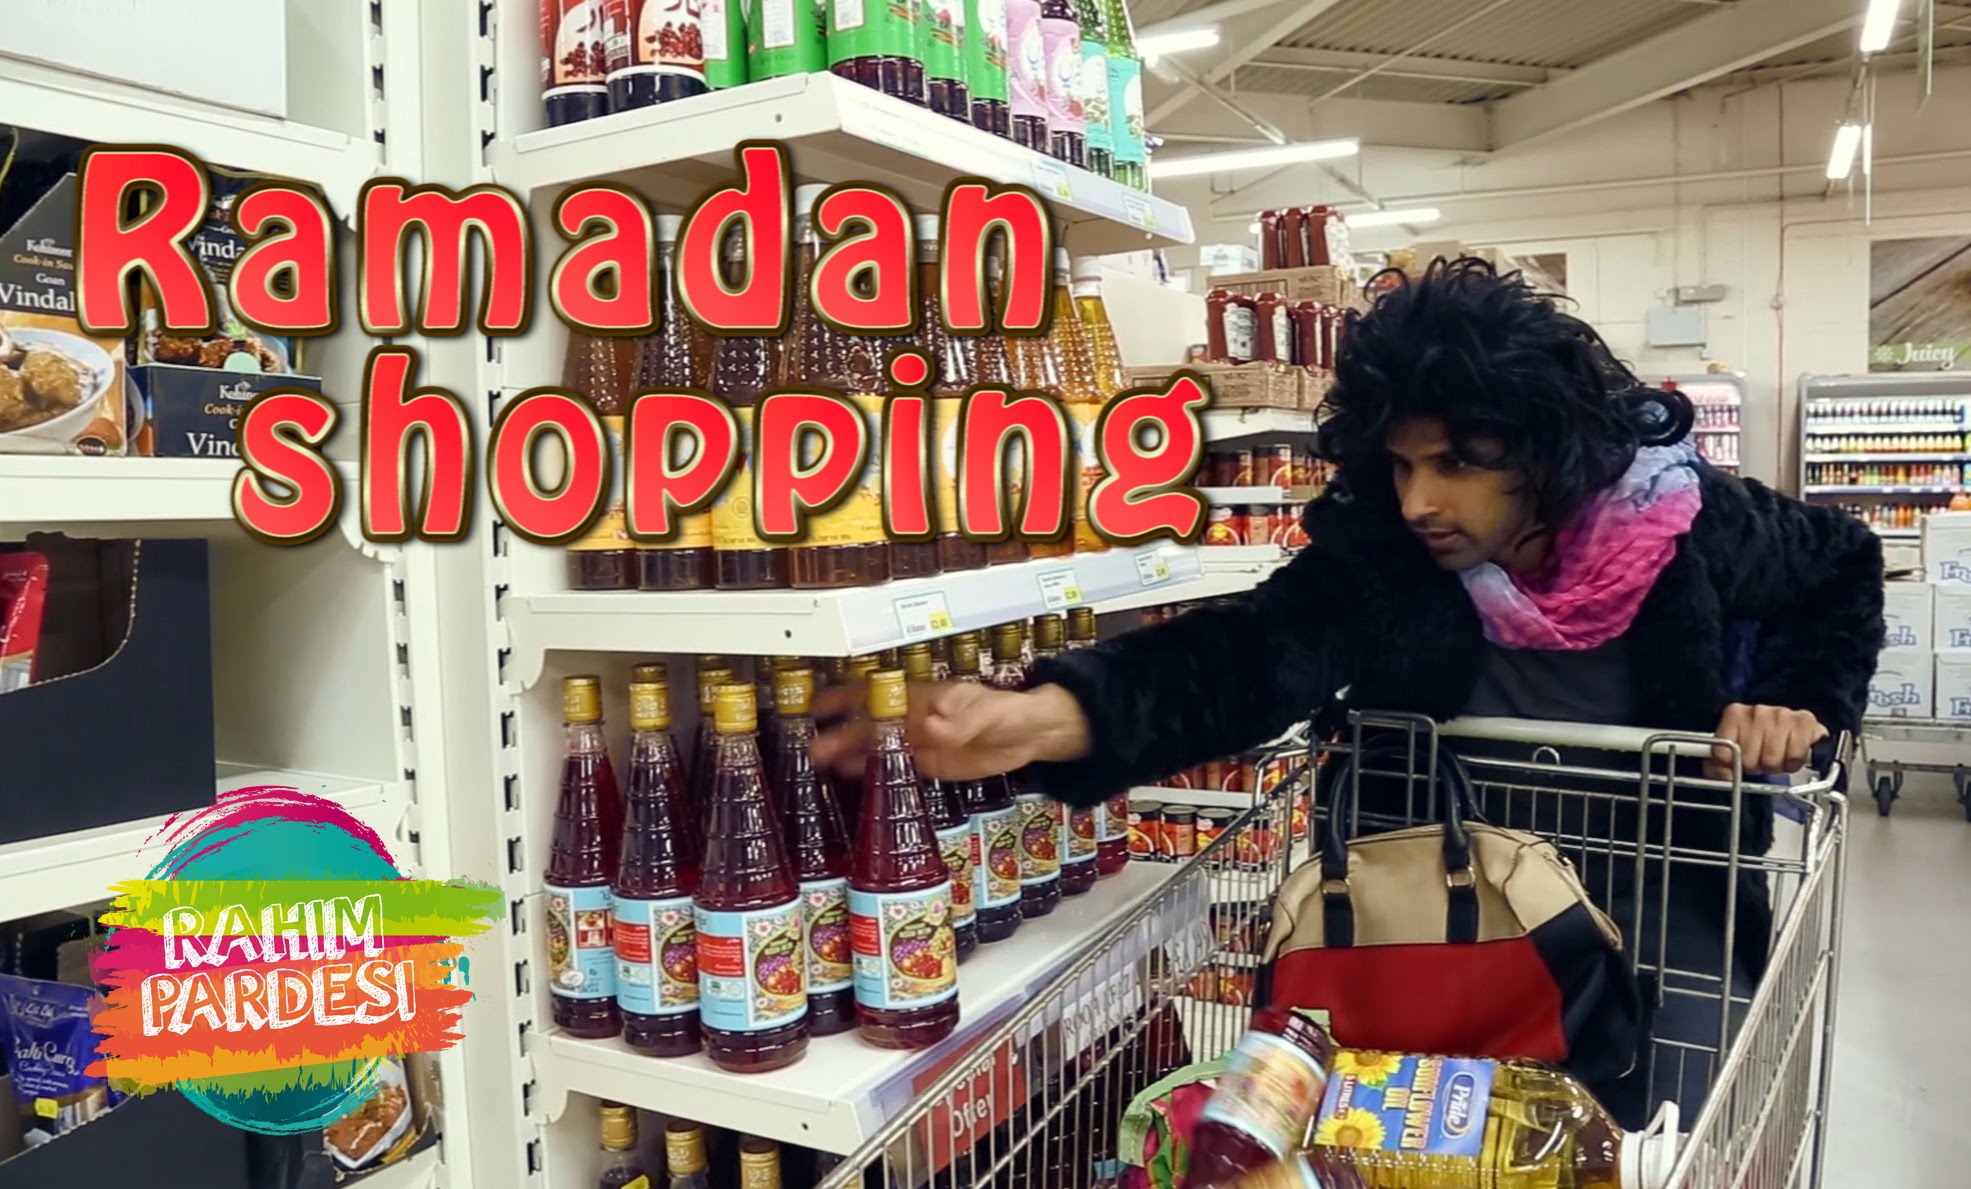 Ramadan Shopping | Rahim Pardesi